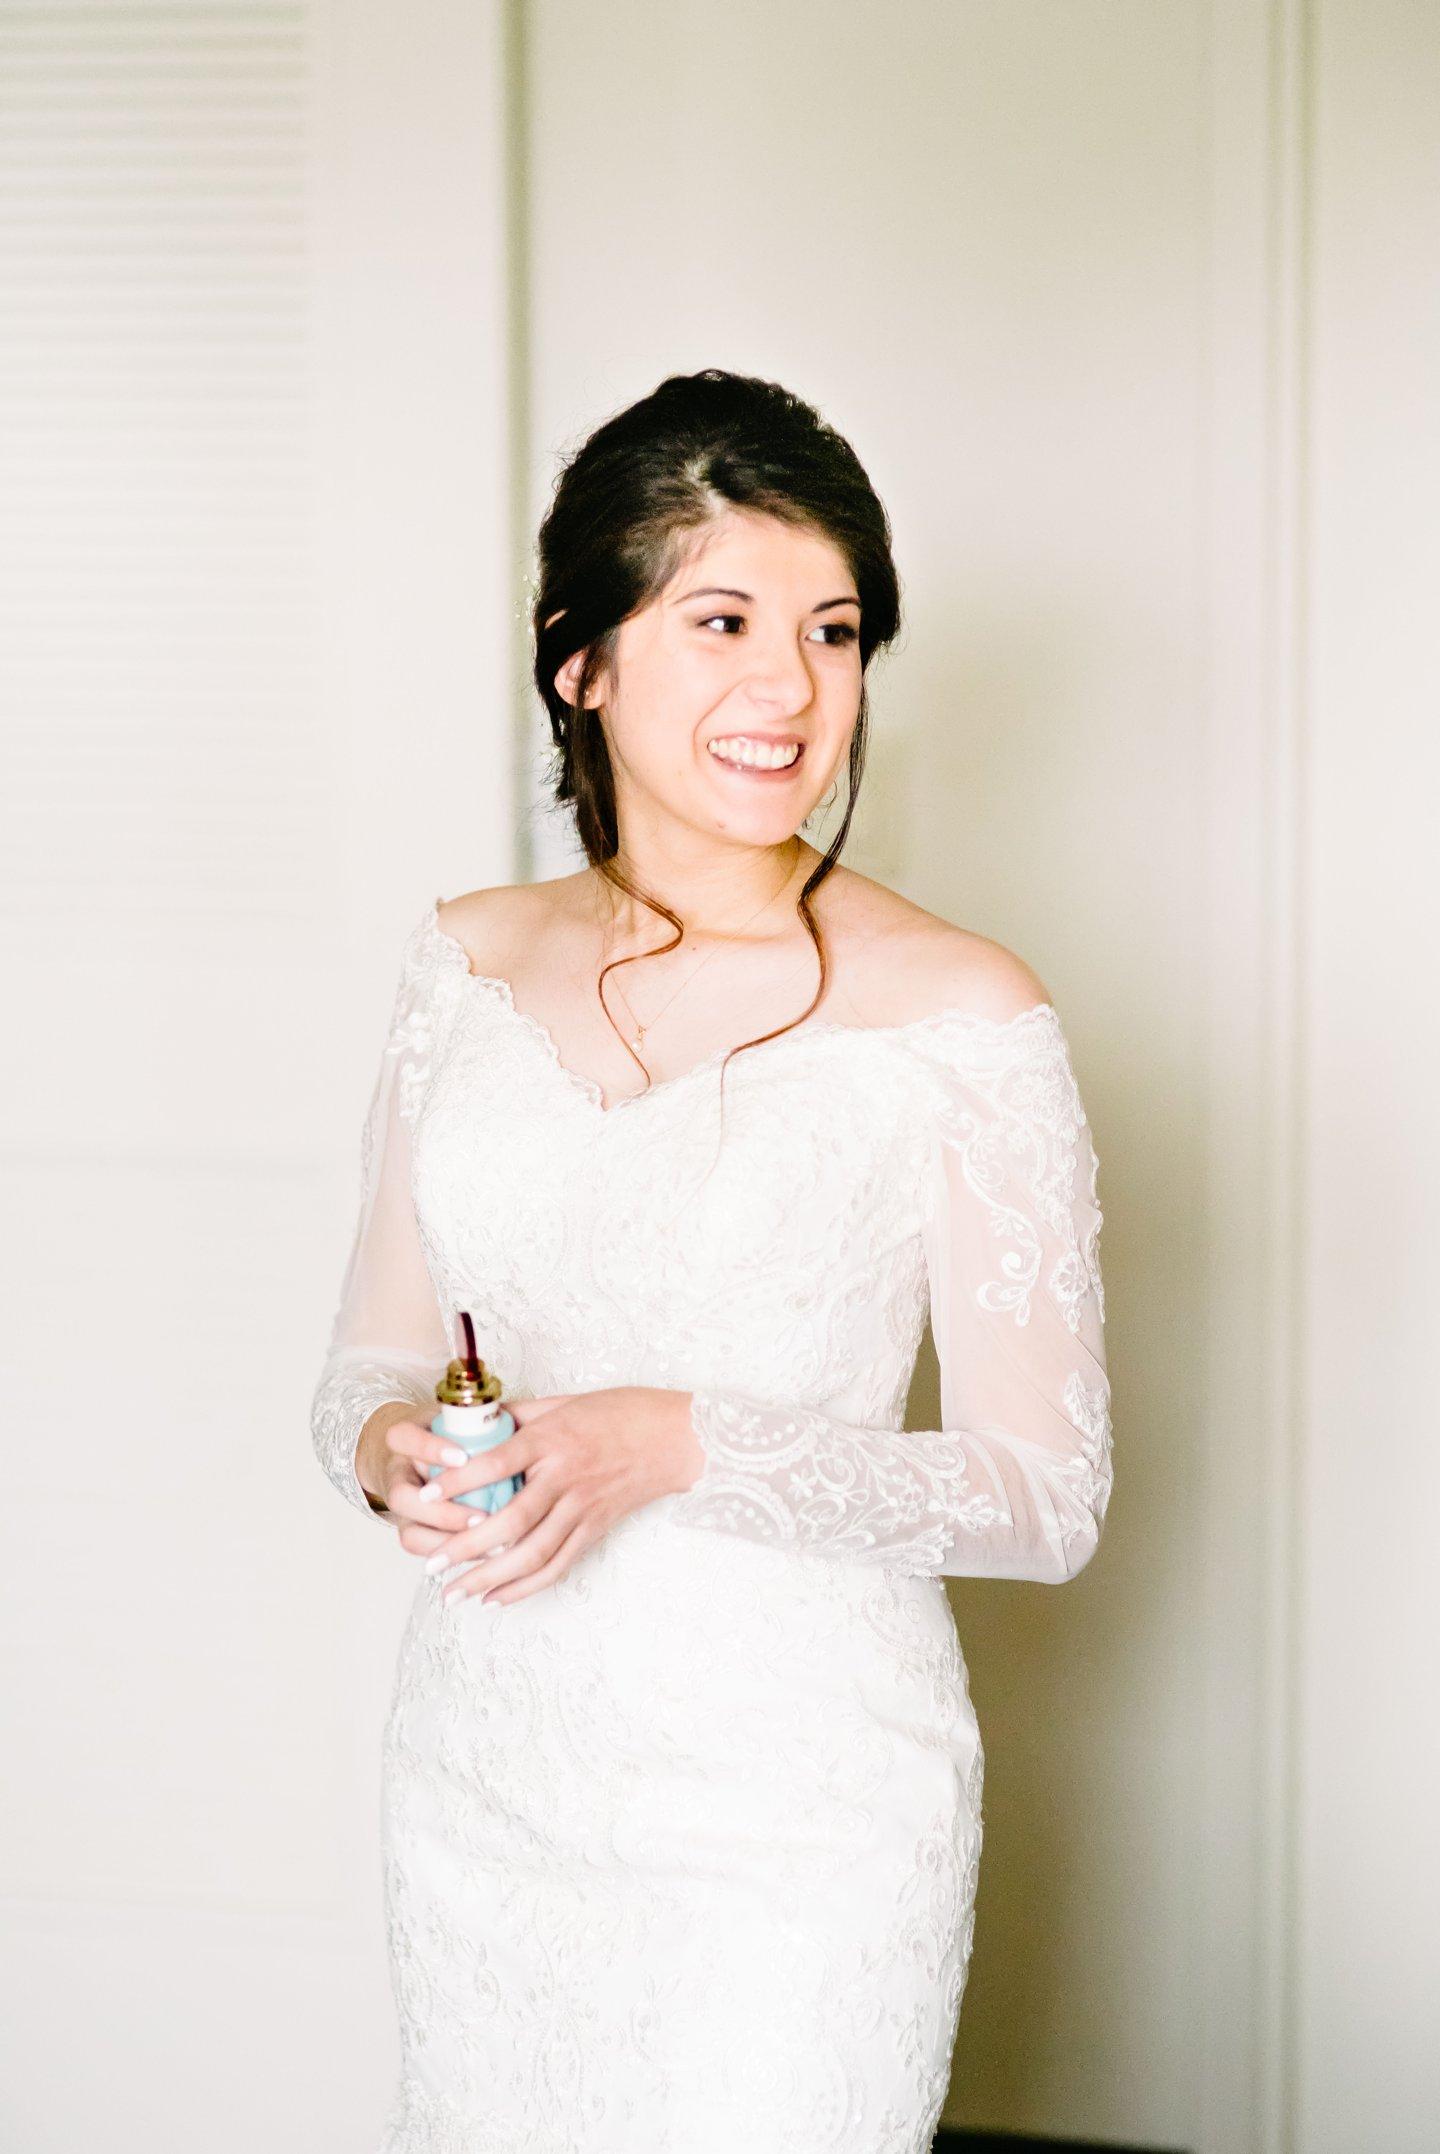 lake-geneva-fine-art-wedding-photographer-santos11